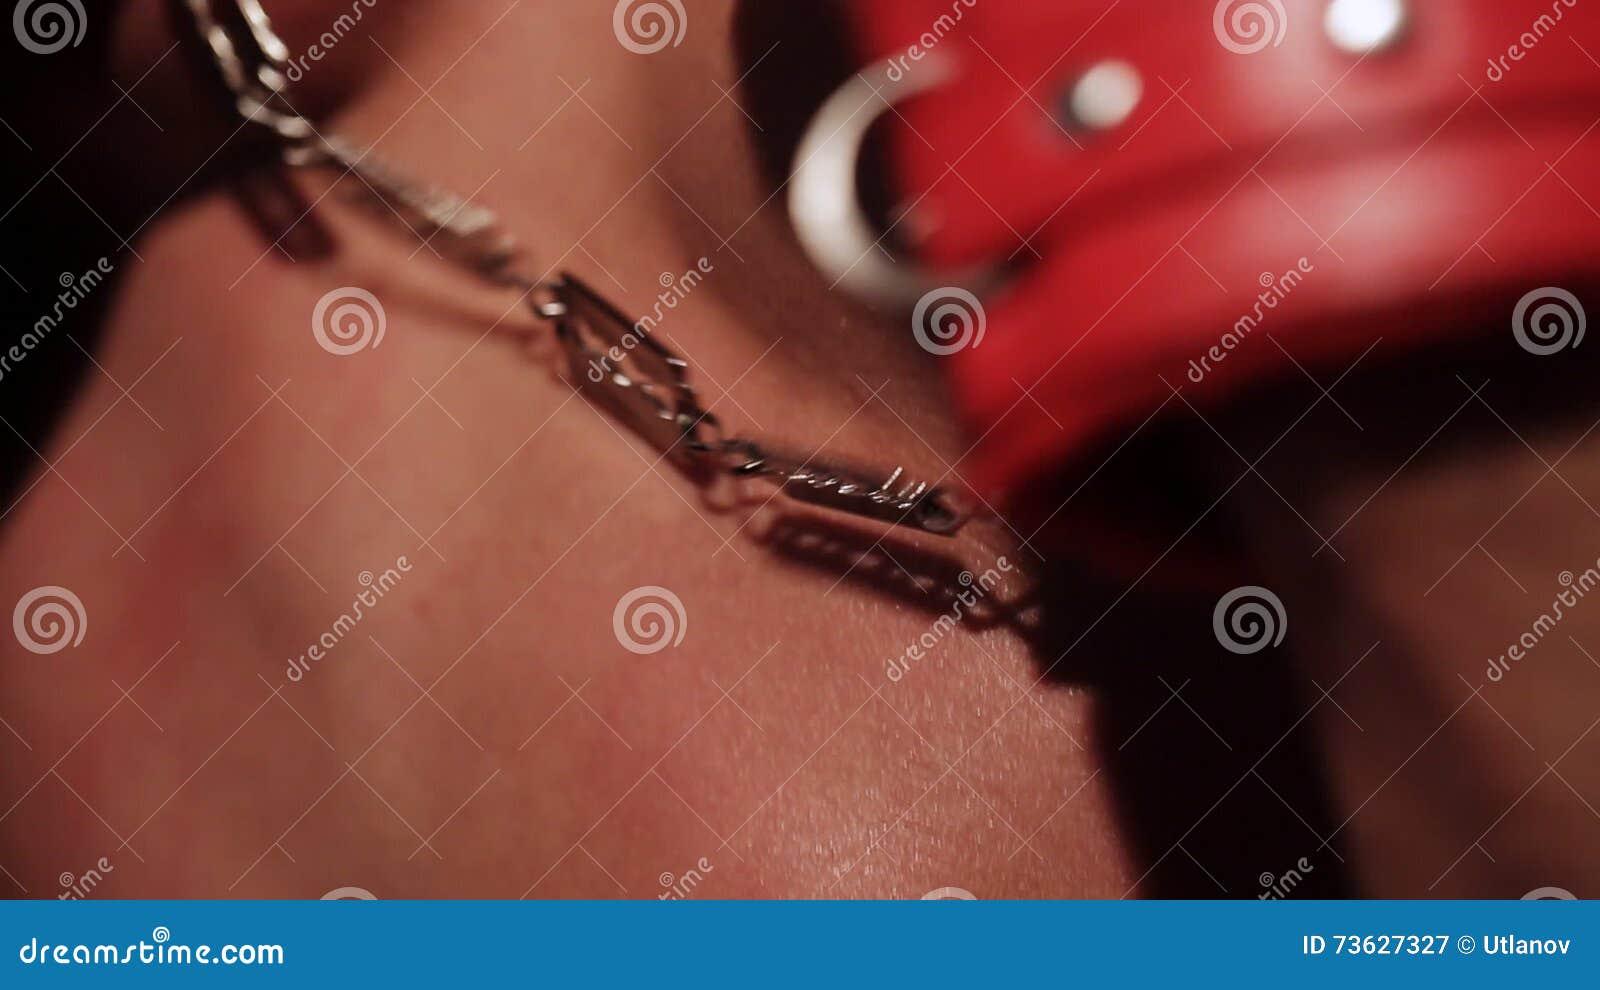 Бдсм наручниках и кляпе фото сучек